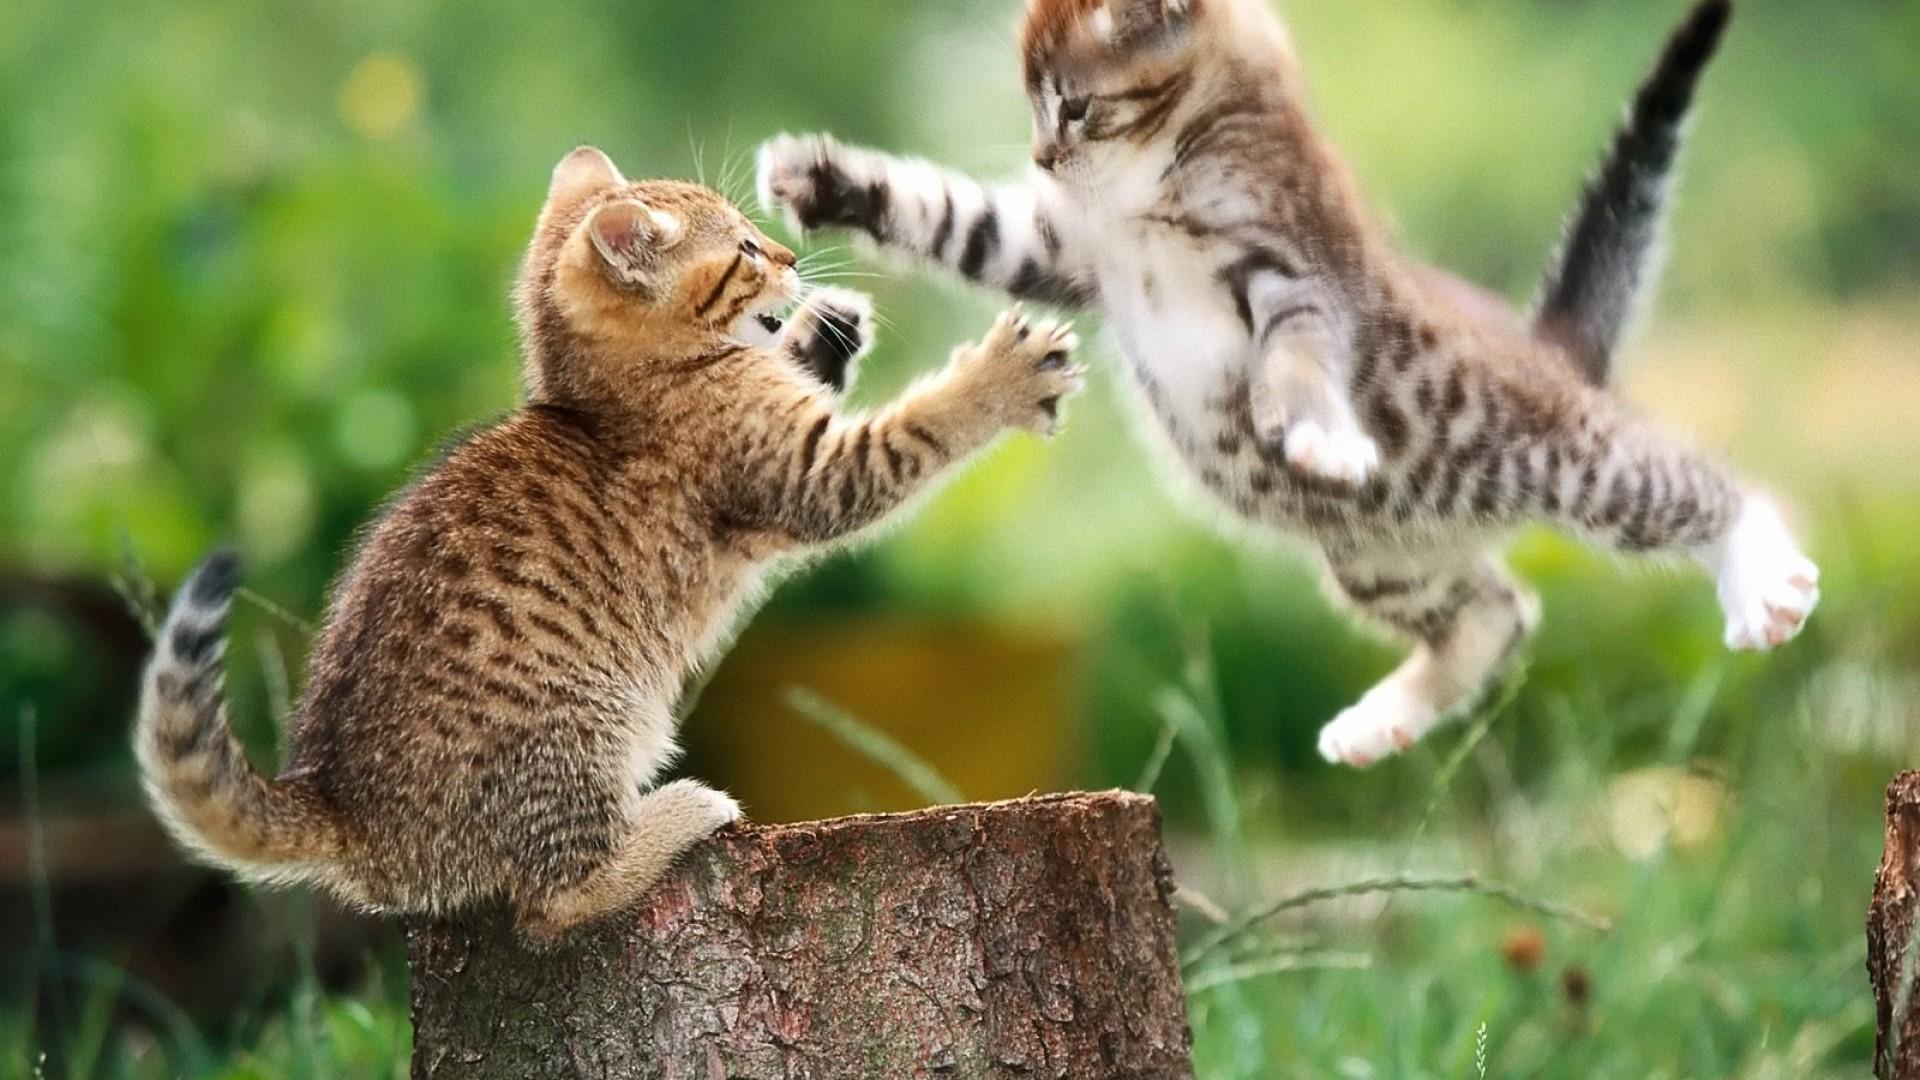 Wallpaper Kittens At Play Desktop High Quality 1920x1080